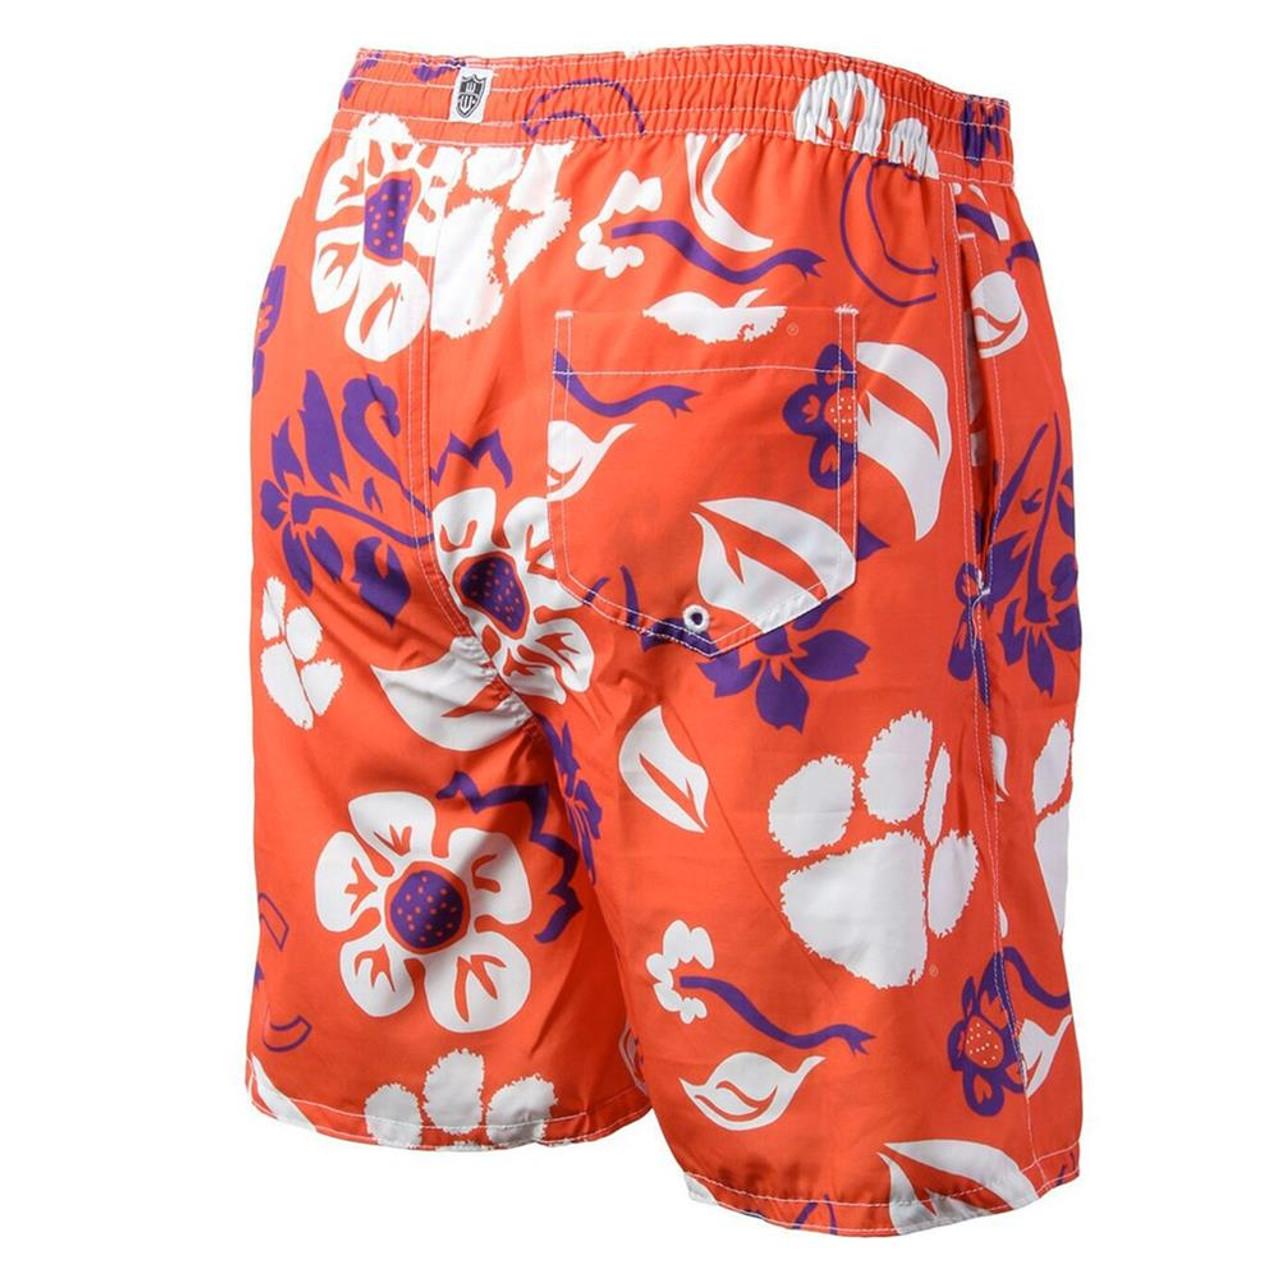 Men's University of Wisconsin Badgers Swim Trunks Floral Swim Shorts